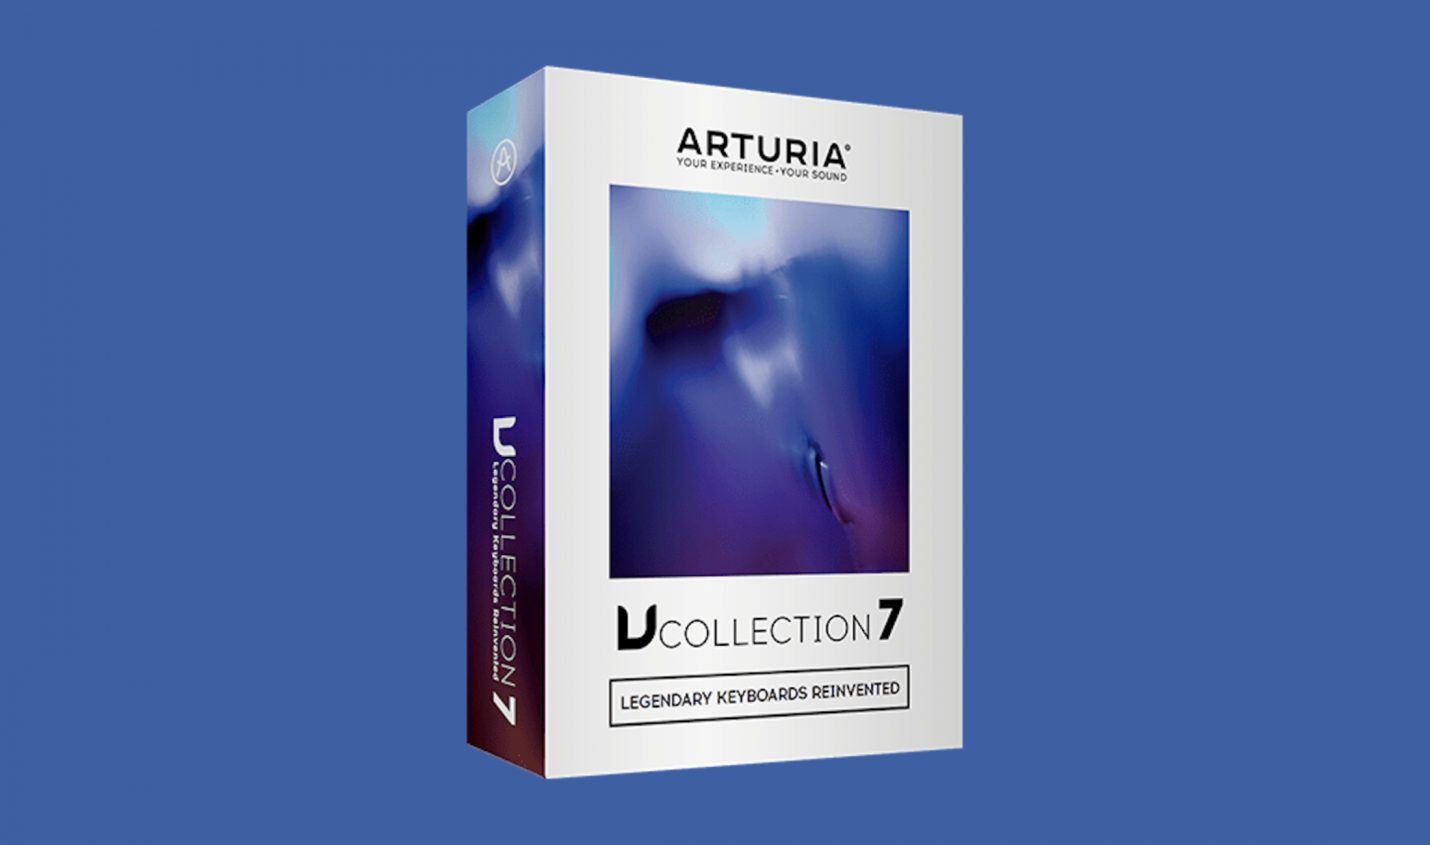 Neu: Arturia V Collection 7 angekündigt